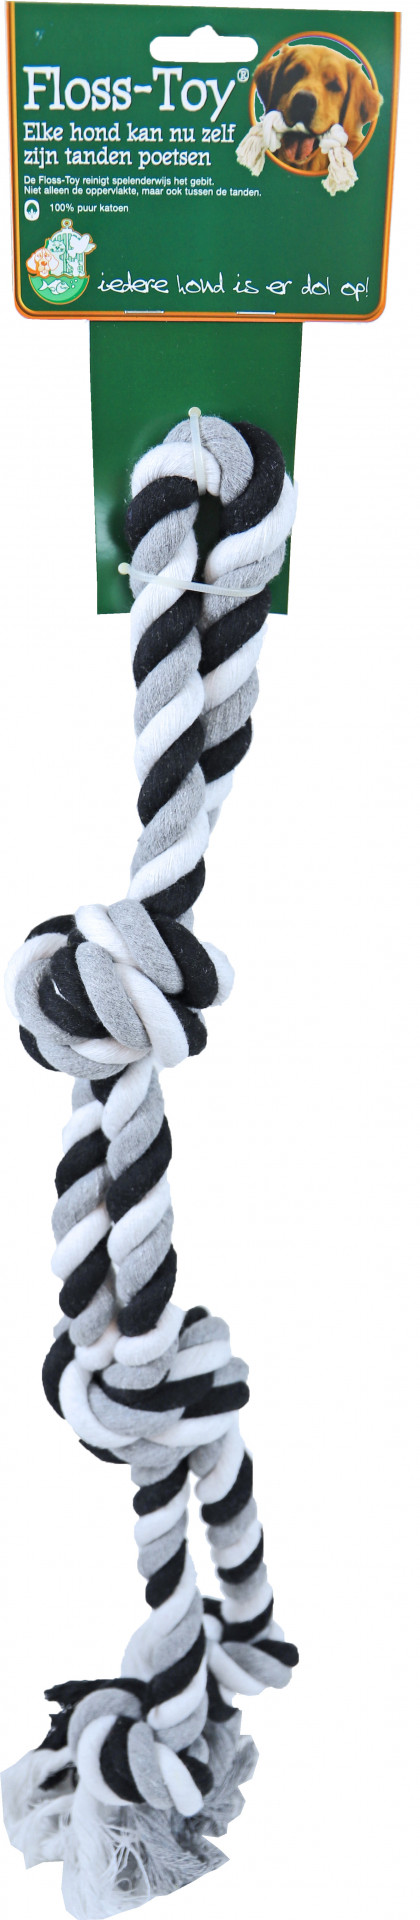 Boon Floss-Toy halter Large zwart/wit